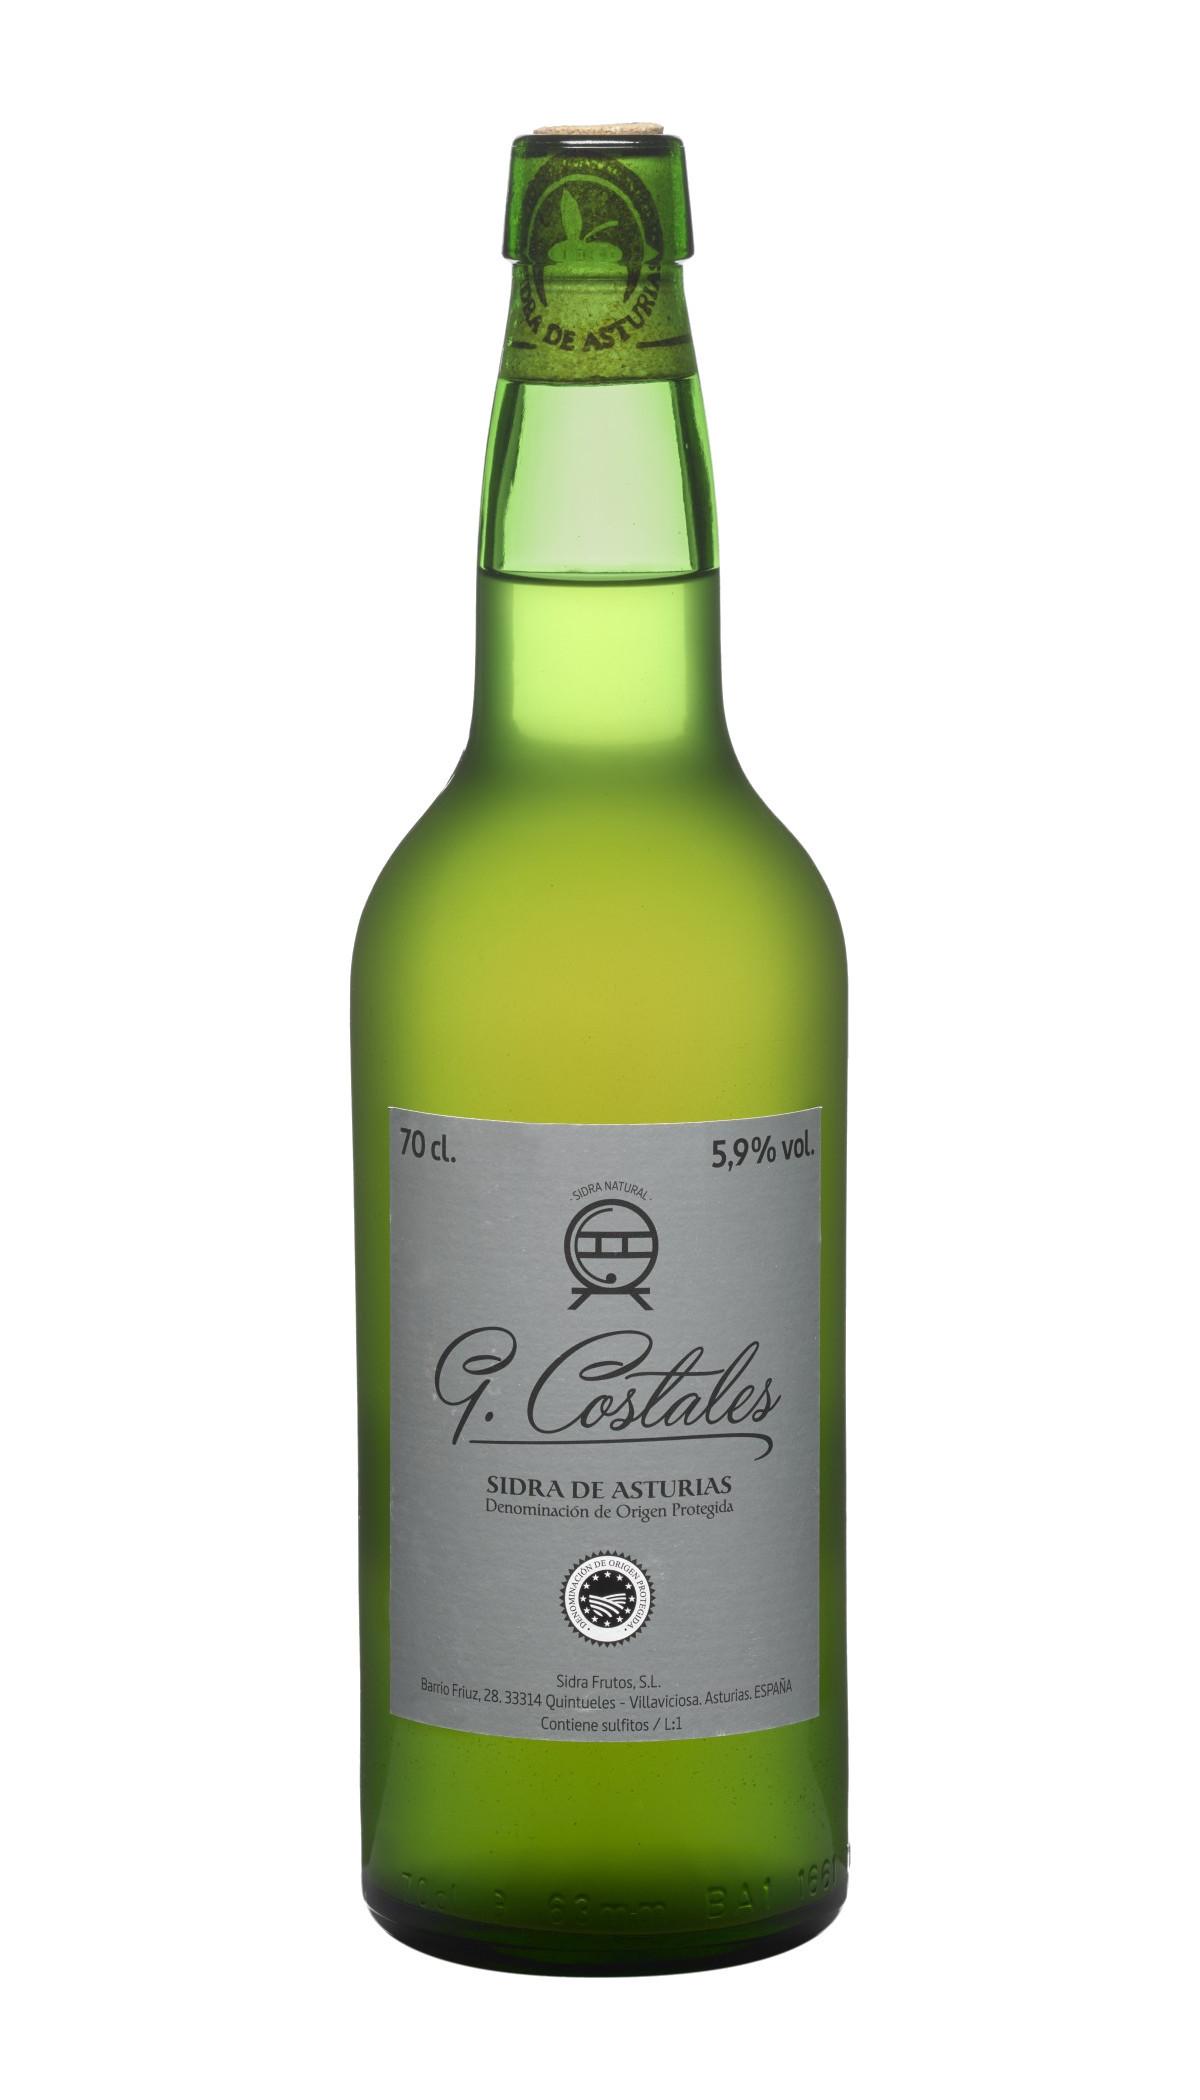 Botella de Sidra Natural G. Costales